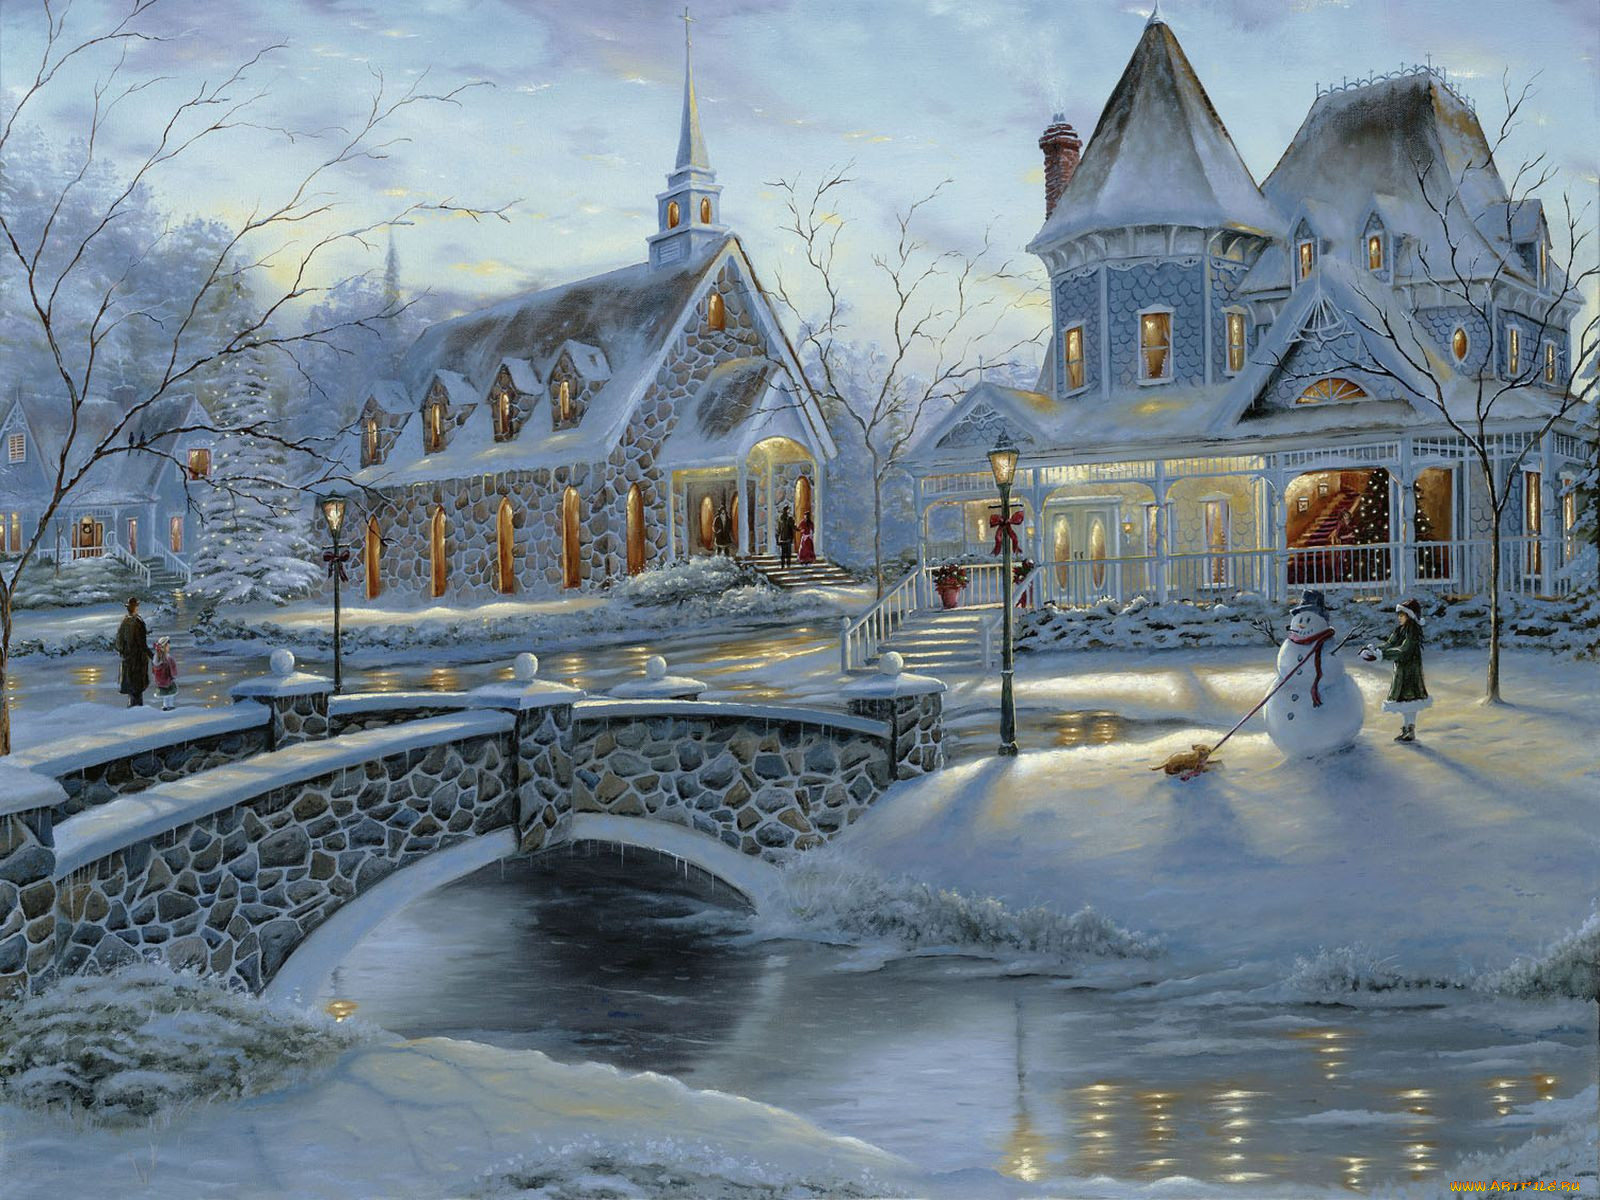 Зимняя рисованная картинка